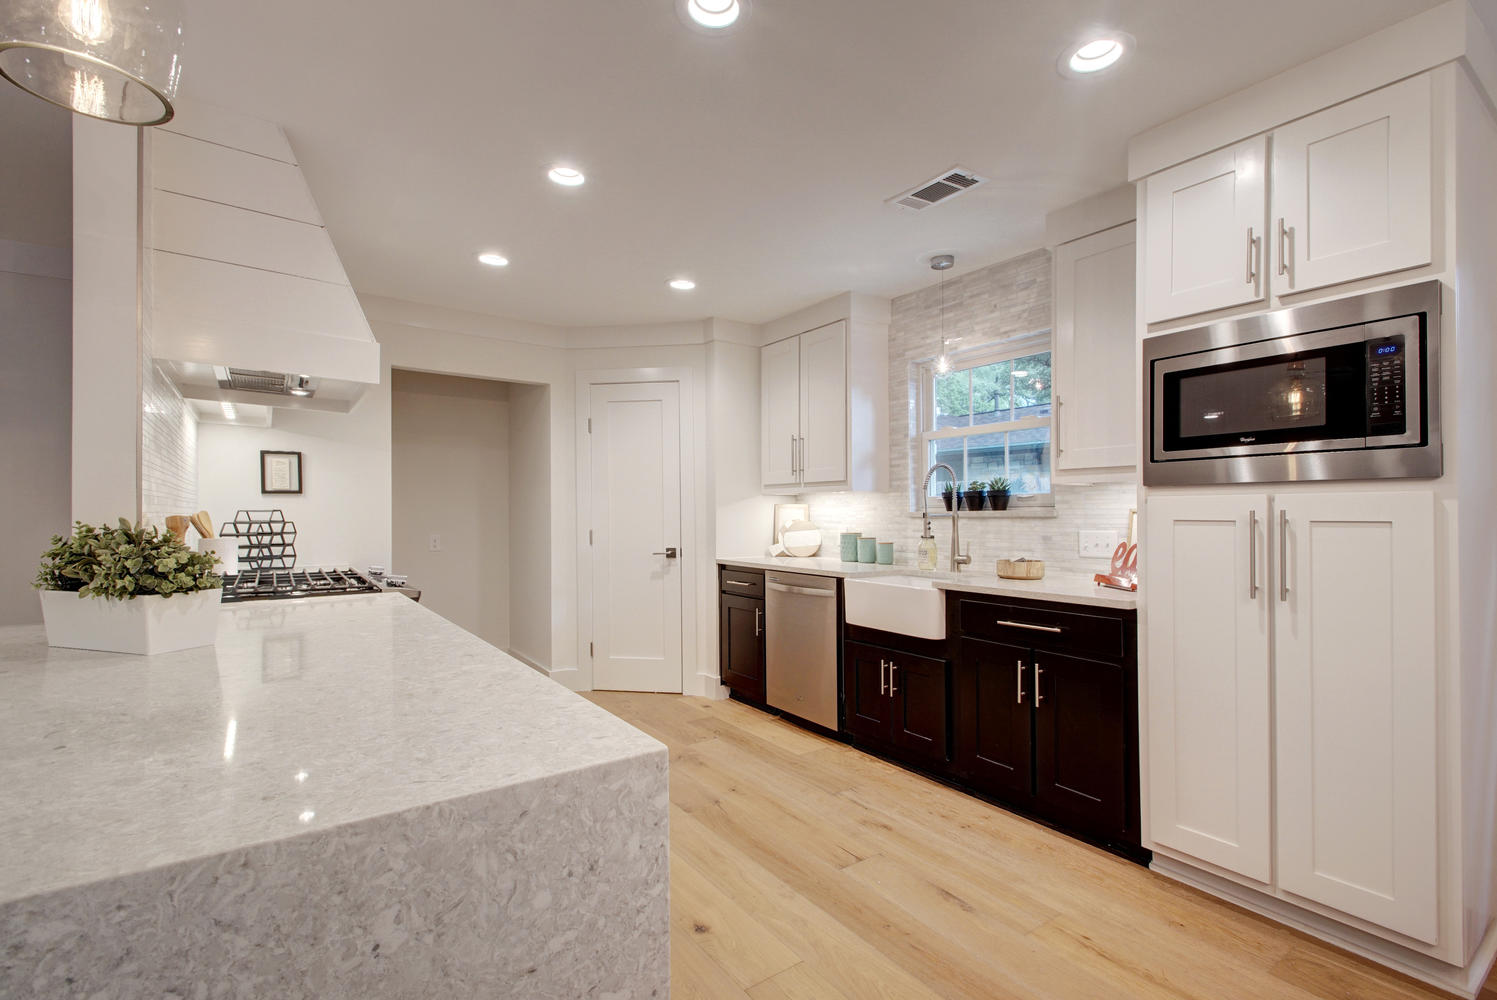 8707 Azalea Trail-large-013-8-Family Kitchen Dining 985-1498x1000-72dpi.jpg